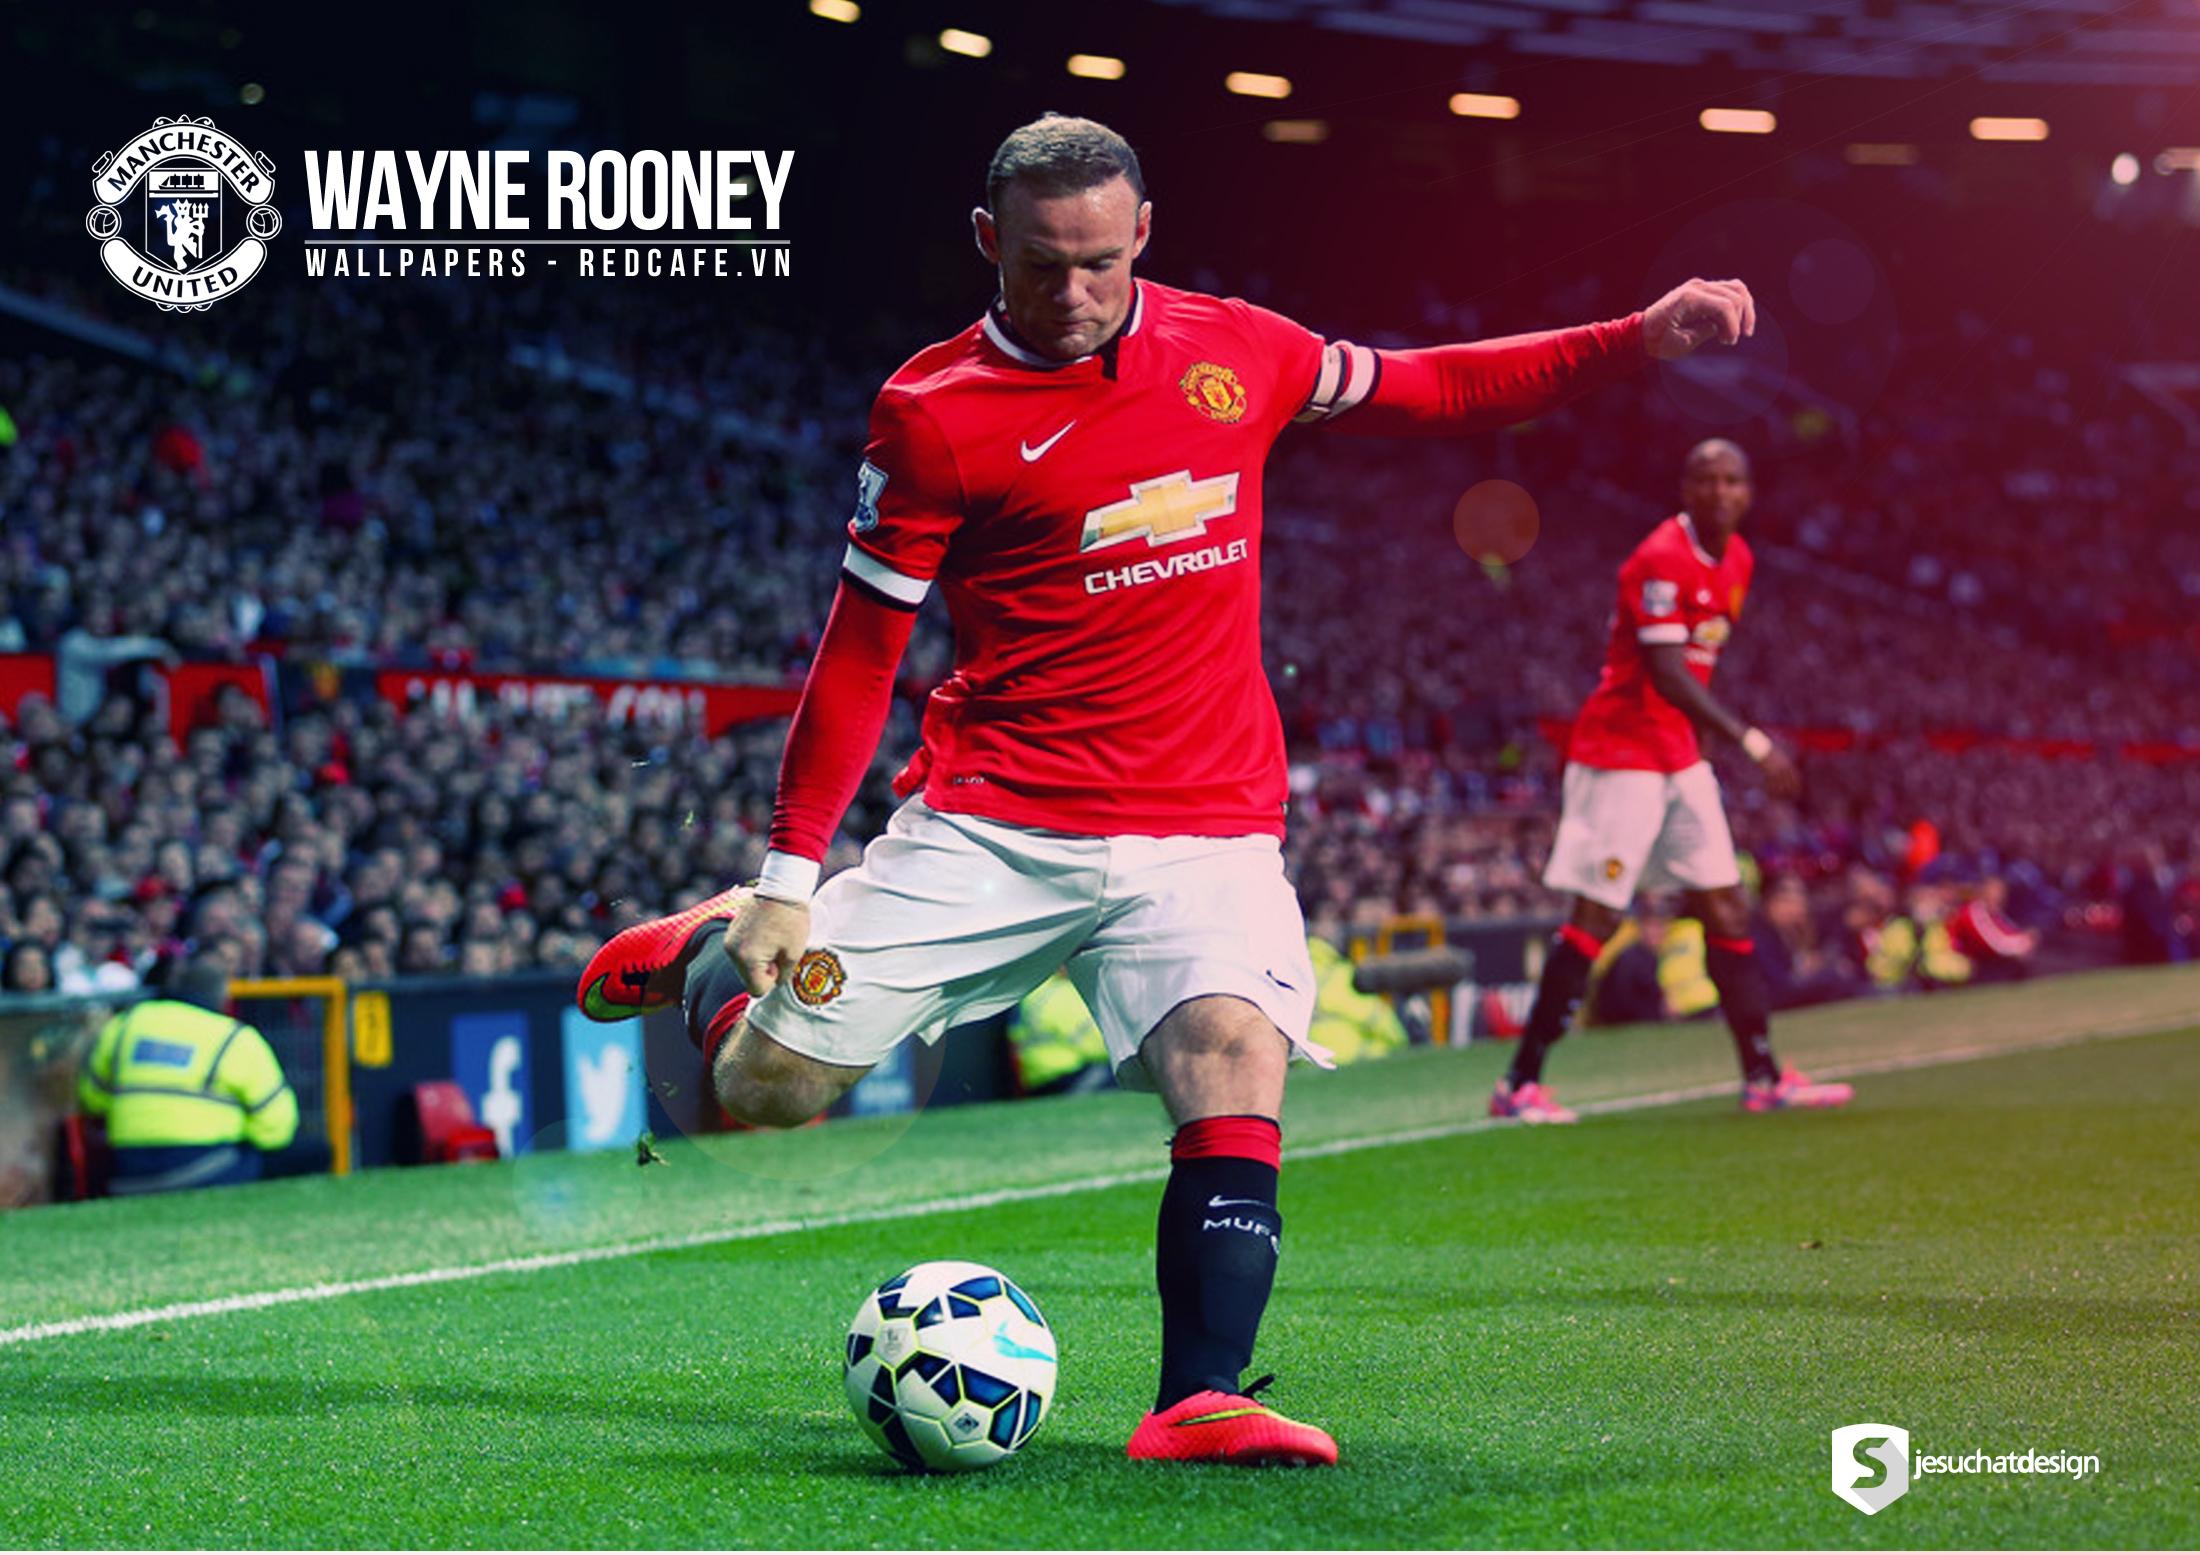 45 ] Man Utd Wallpaper 2015 On WallpaperSafari